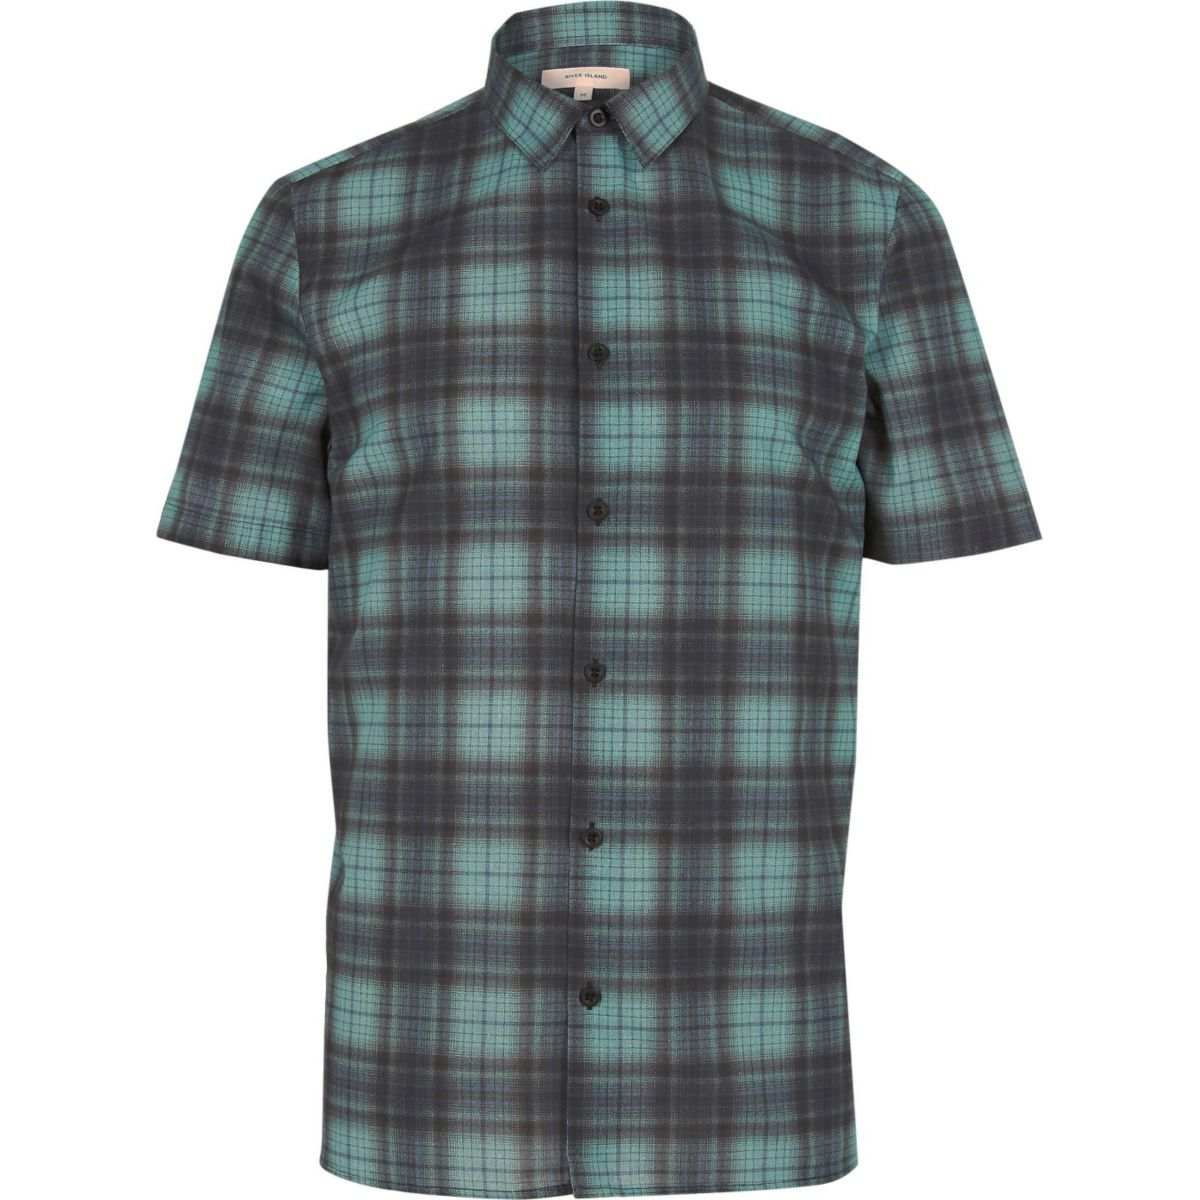 Blau kariertes kurzärmeliges Hemd